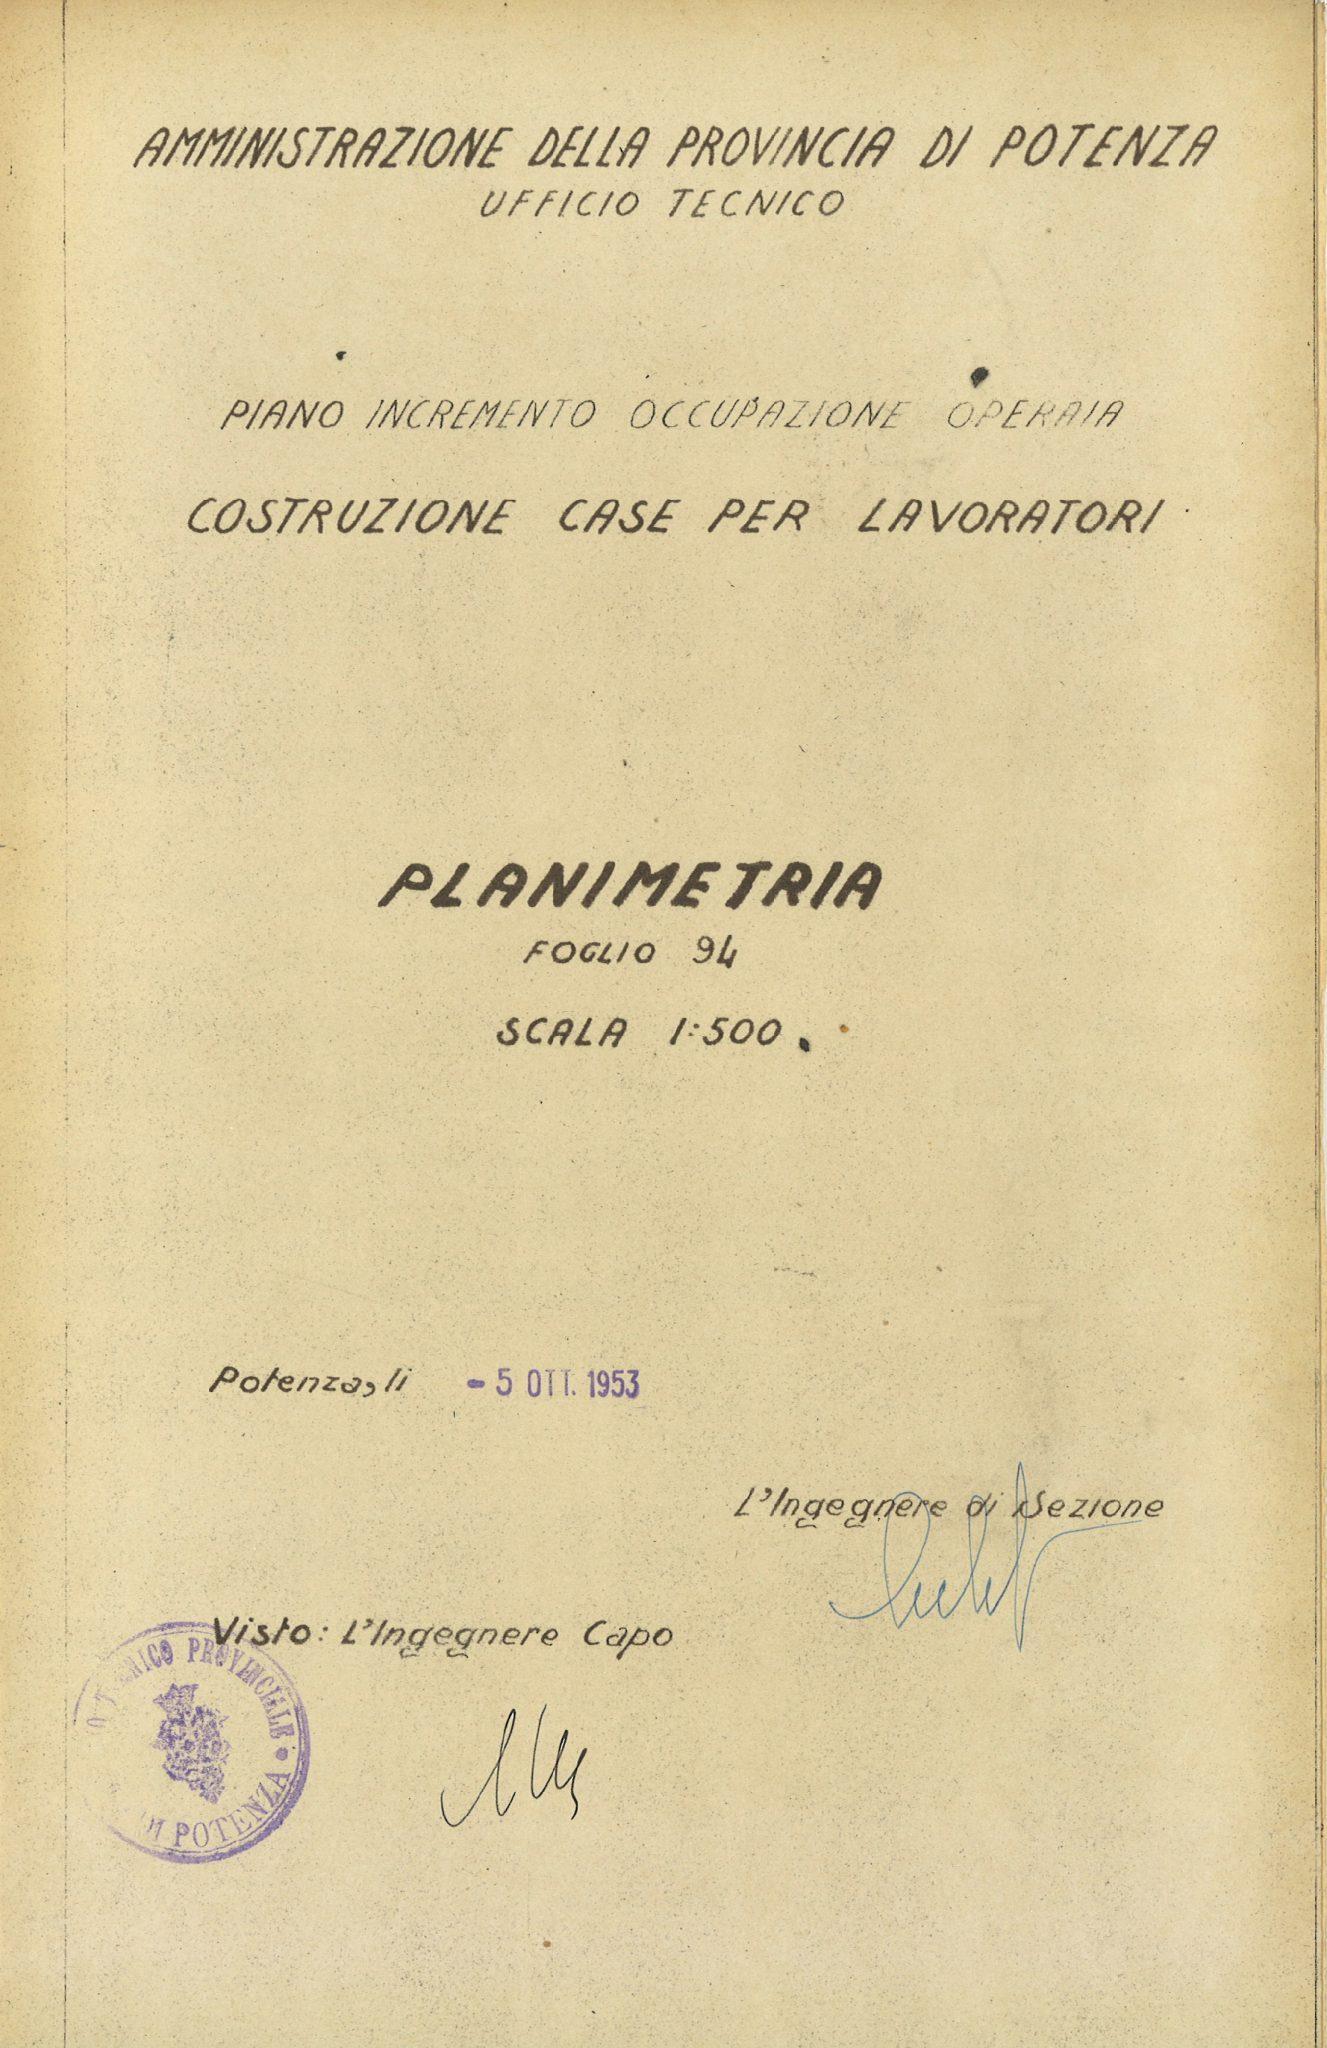 Planimetry of areas for INA-Casa constructions (Potenza, 1953)